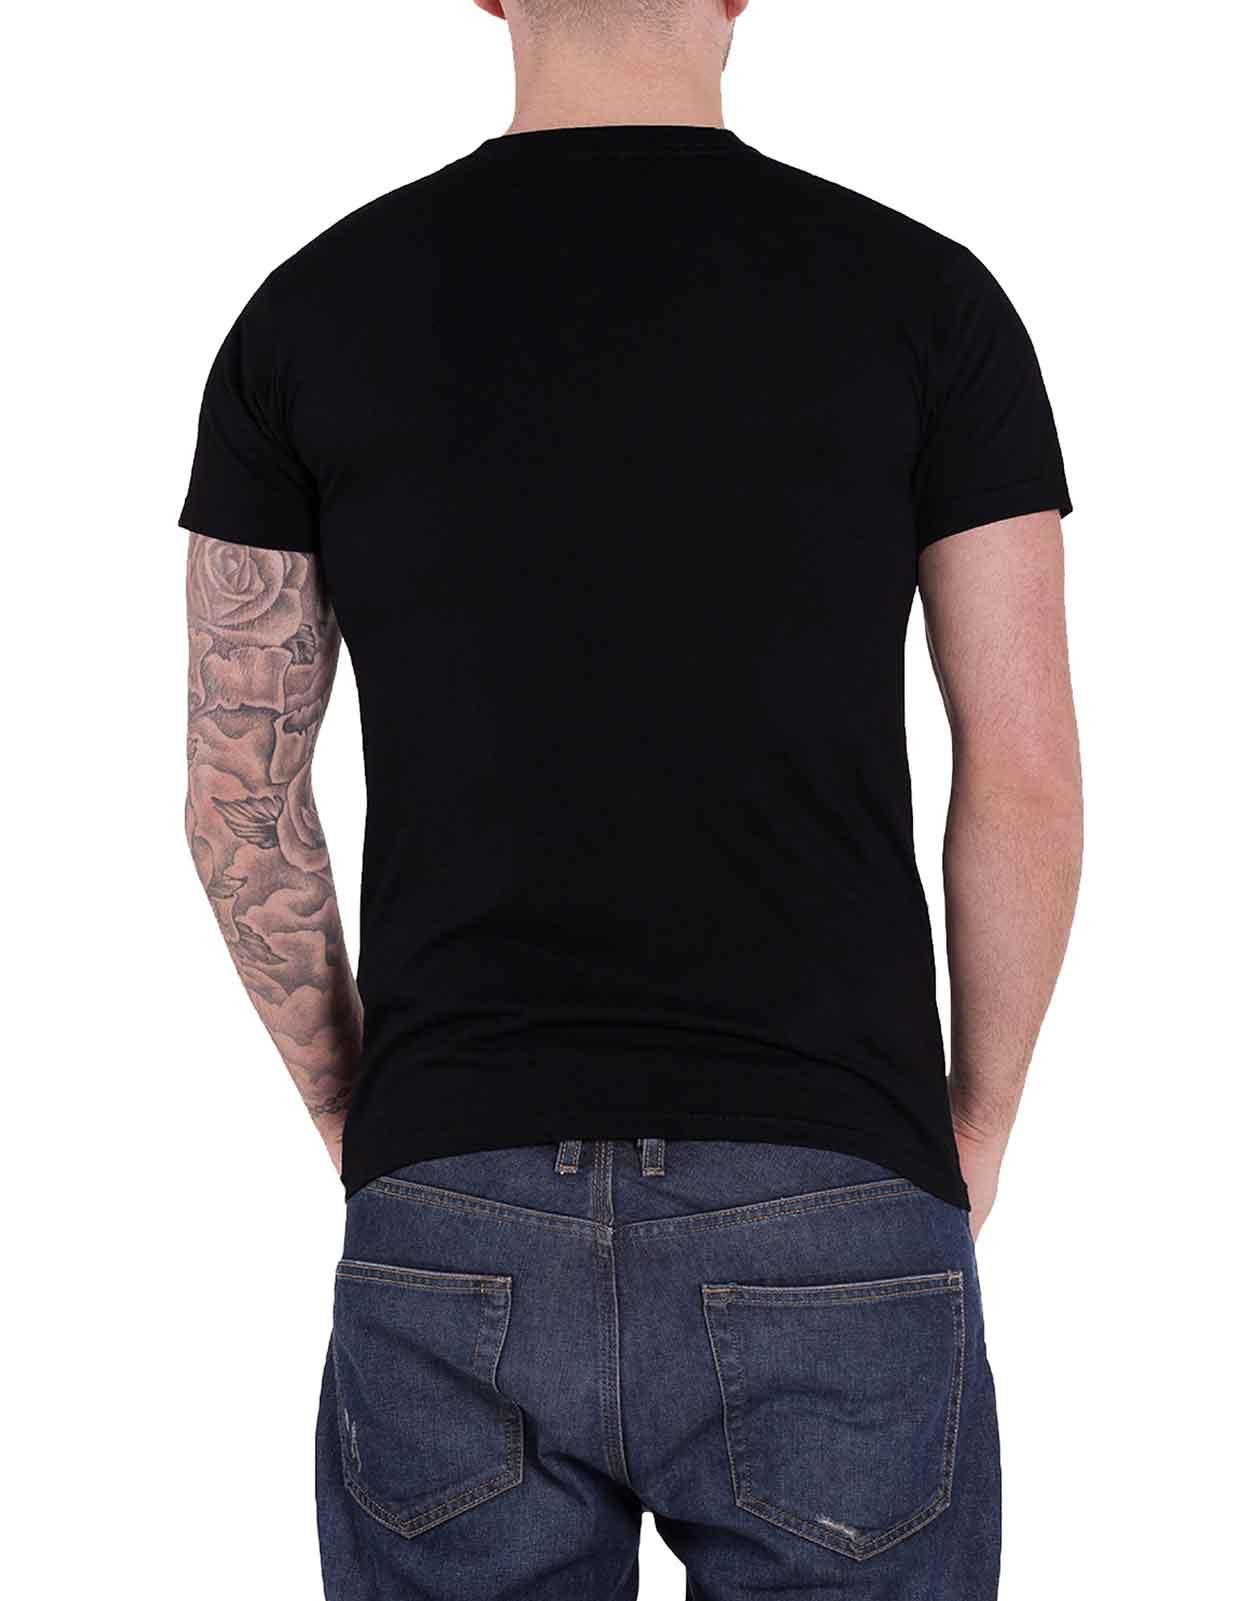 Officiel-Jimi-Hendrix-T-Shirt-Purple-Haze-Are-you-experienced-Logo-Homme-NEUF miniature 23